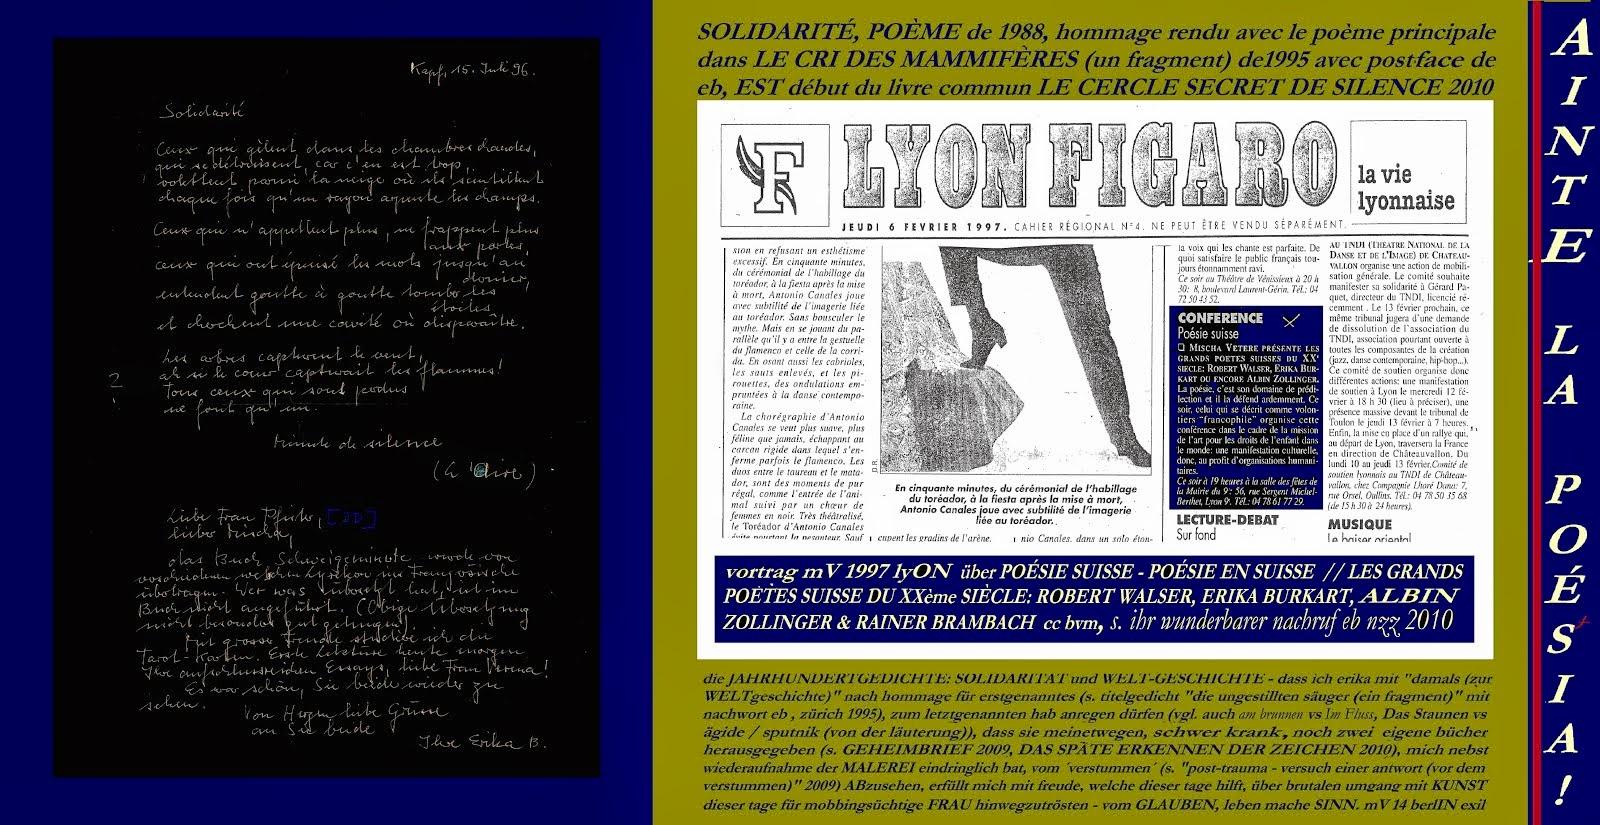 SOLIDARITÄT von erika burkart LYON FIGARO vortrag mischa vetere 1997 lyON bvm LA RÉVOLUTION MENTALE